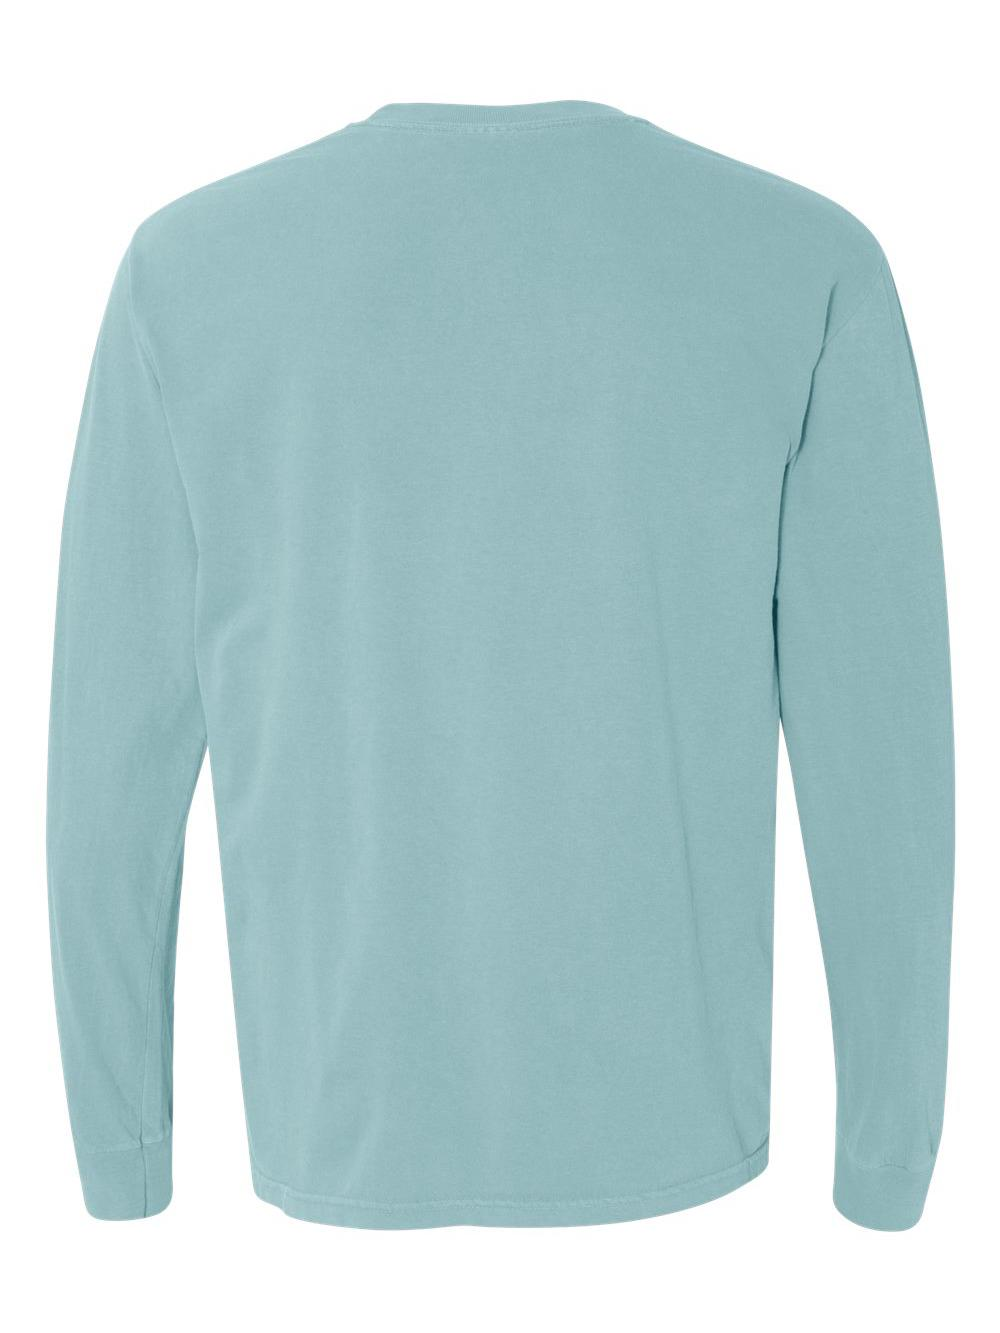 Comfort-Colors-Garment-Dyed-Heavyweight-Ringspun-Long-Sleeve-T-Shirt-6014 thumbnail 25